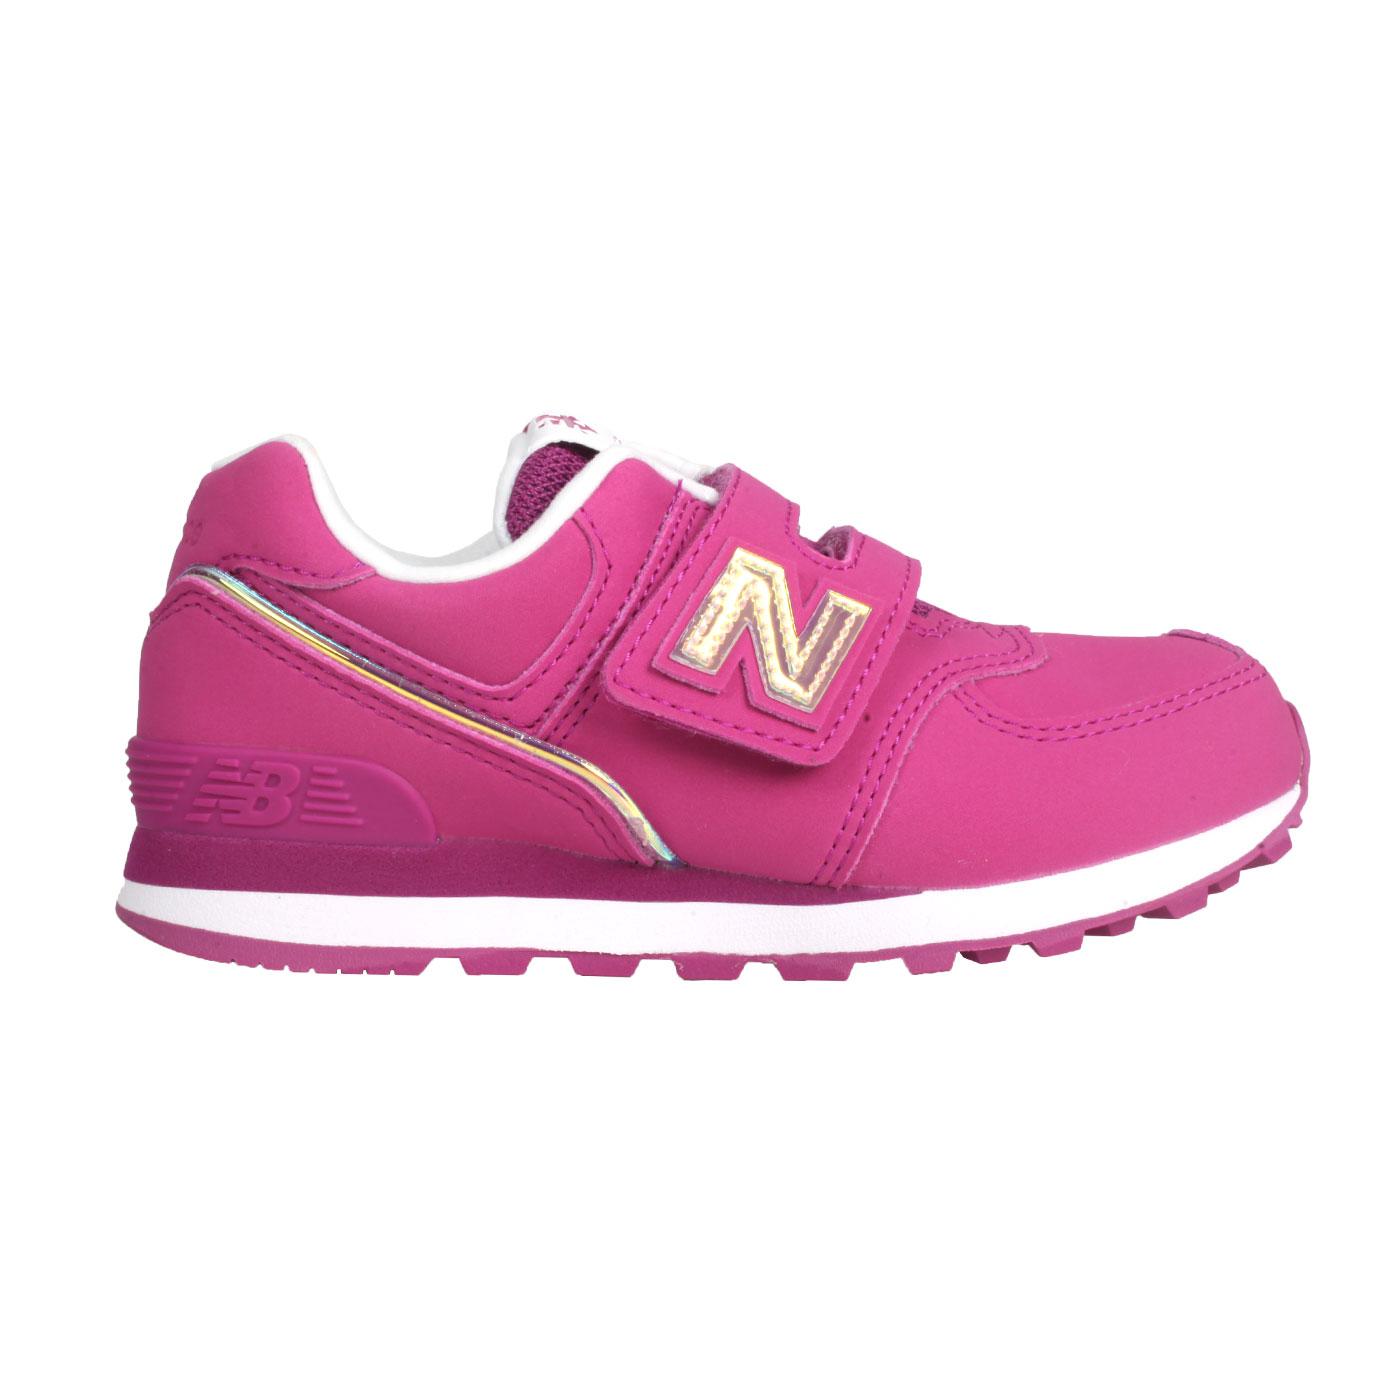 NEW BALANCE 中童休閒運動鞋 YV574MTP - 桃紅香檳金